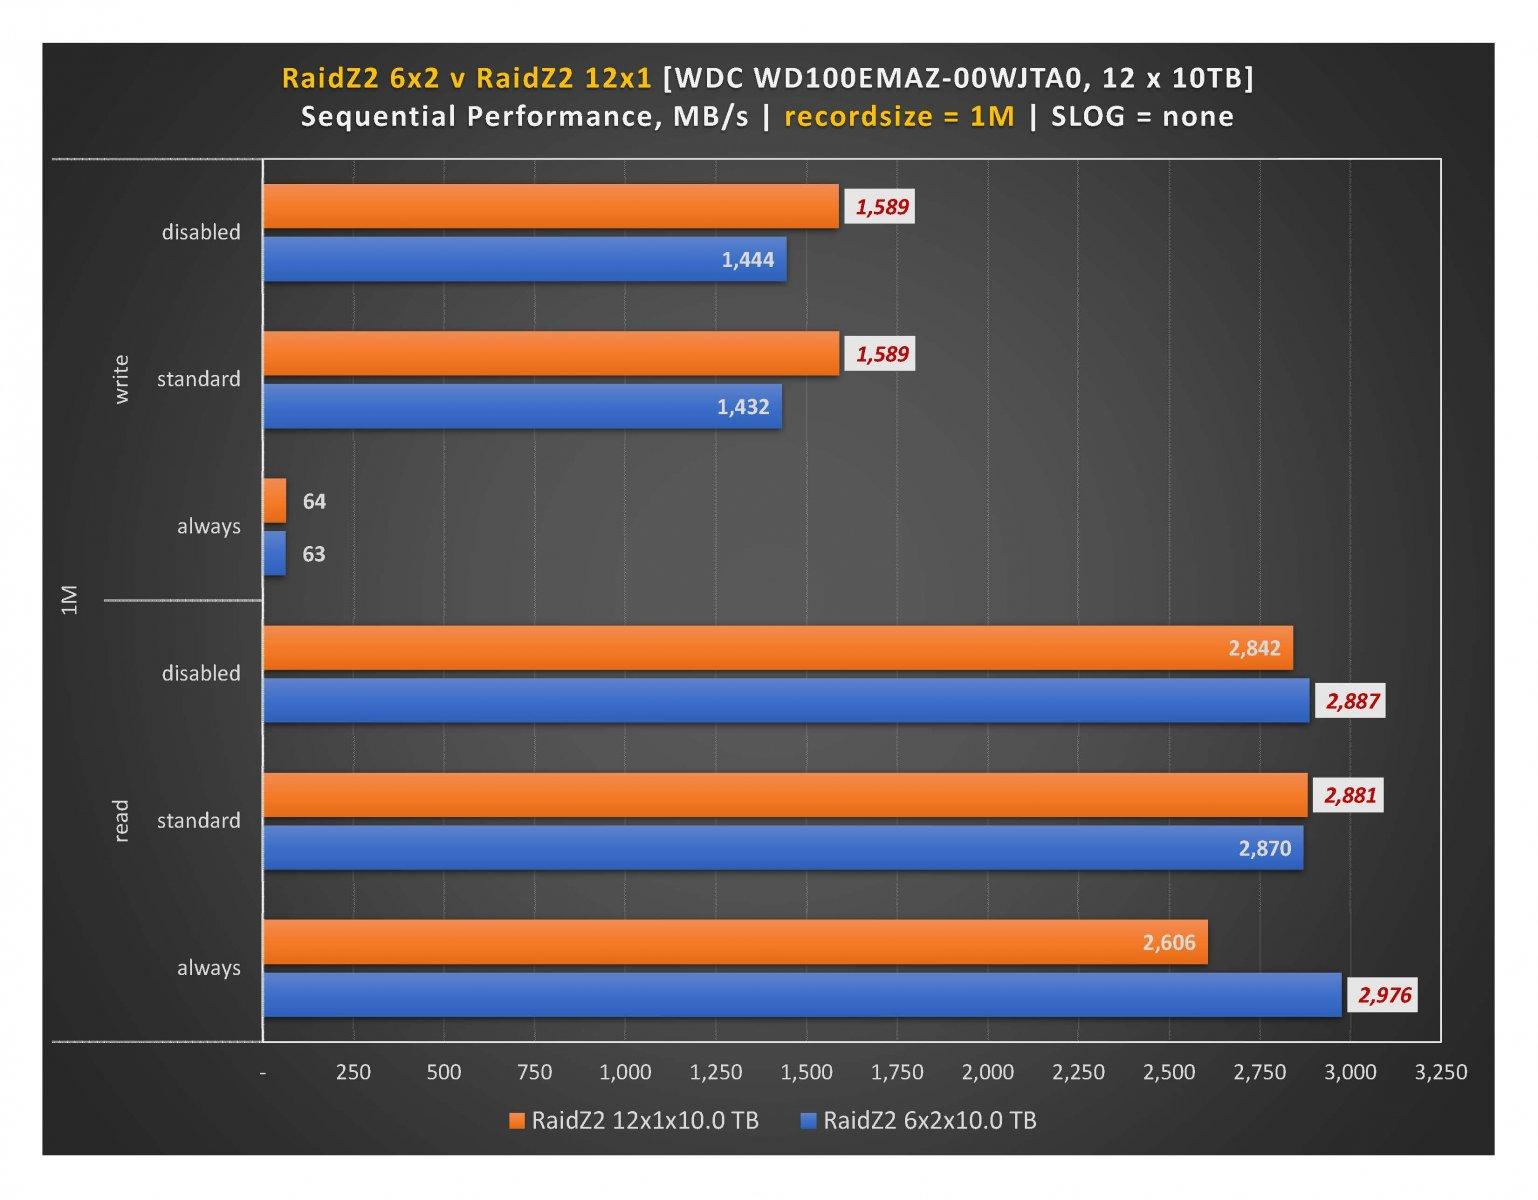 RaidZ2 - 1M recordsize.jpg